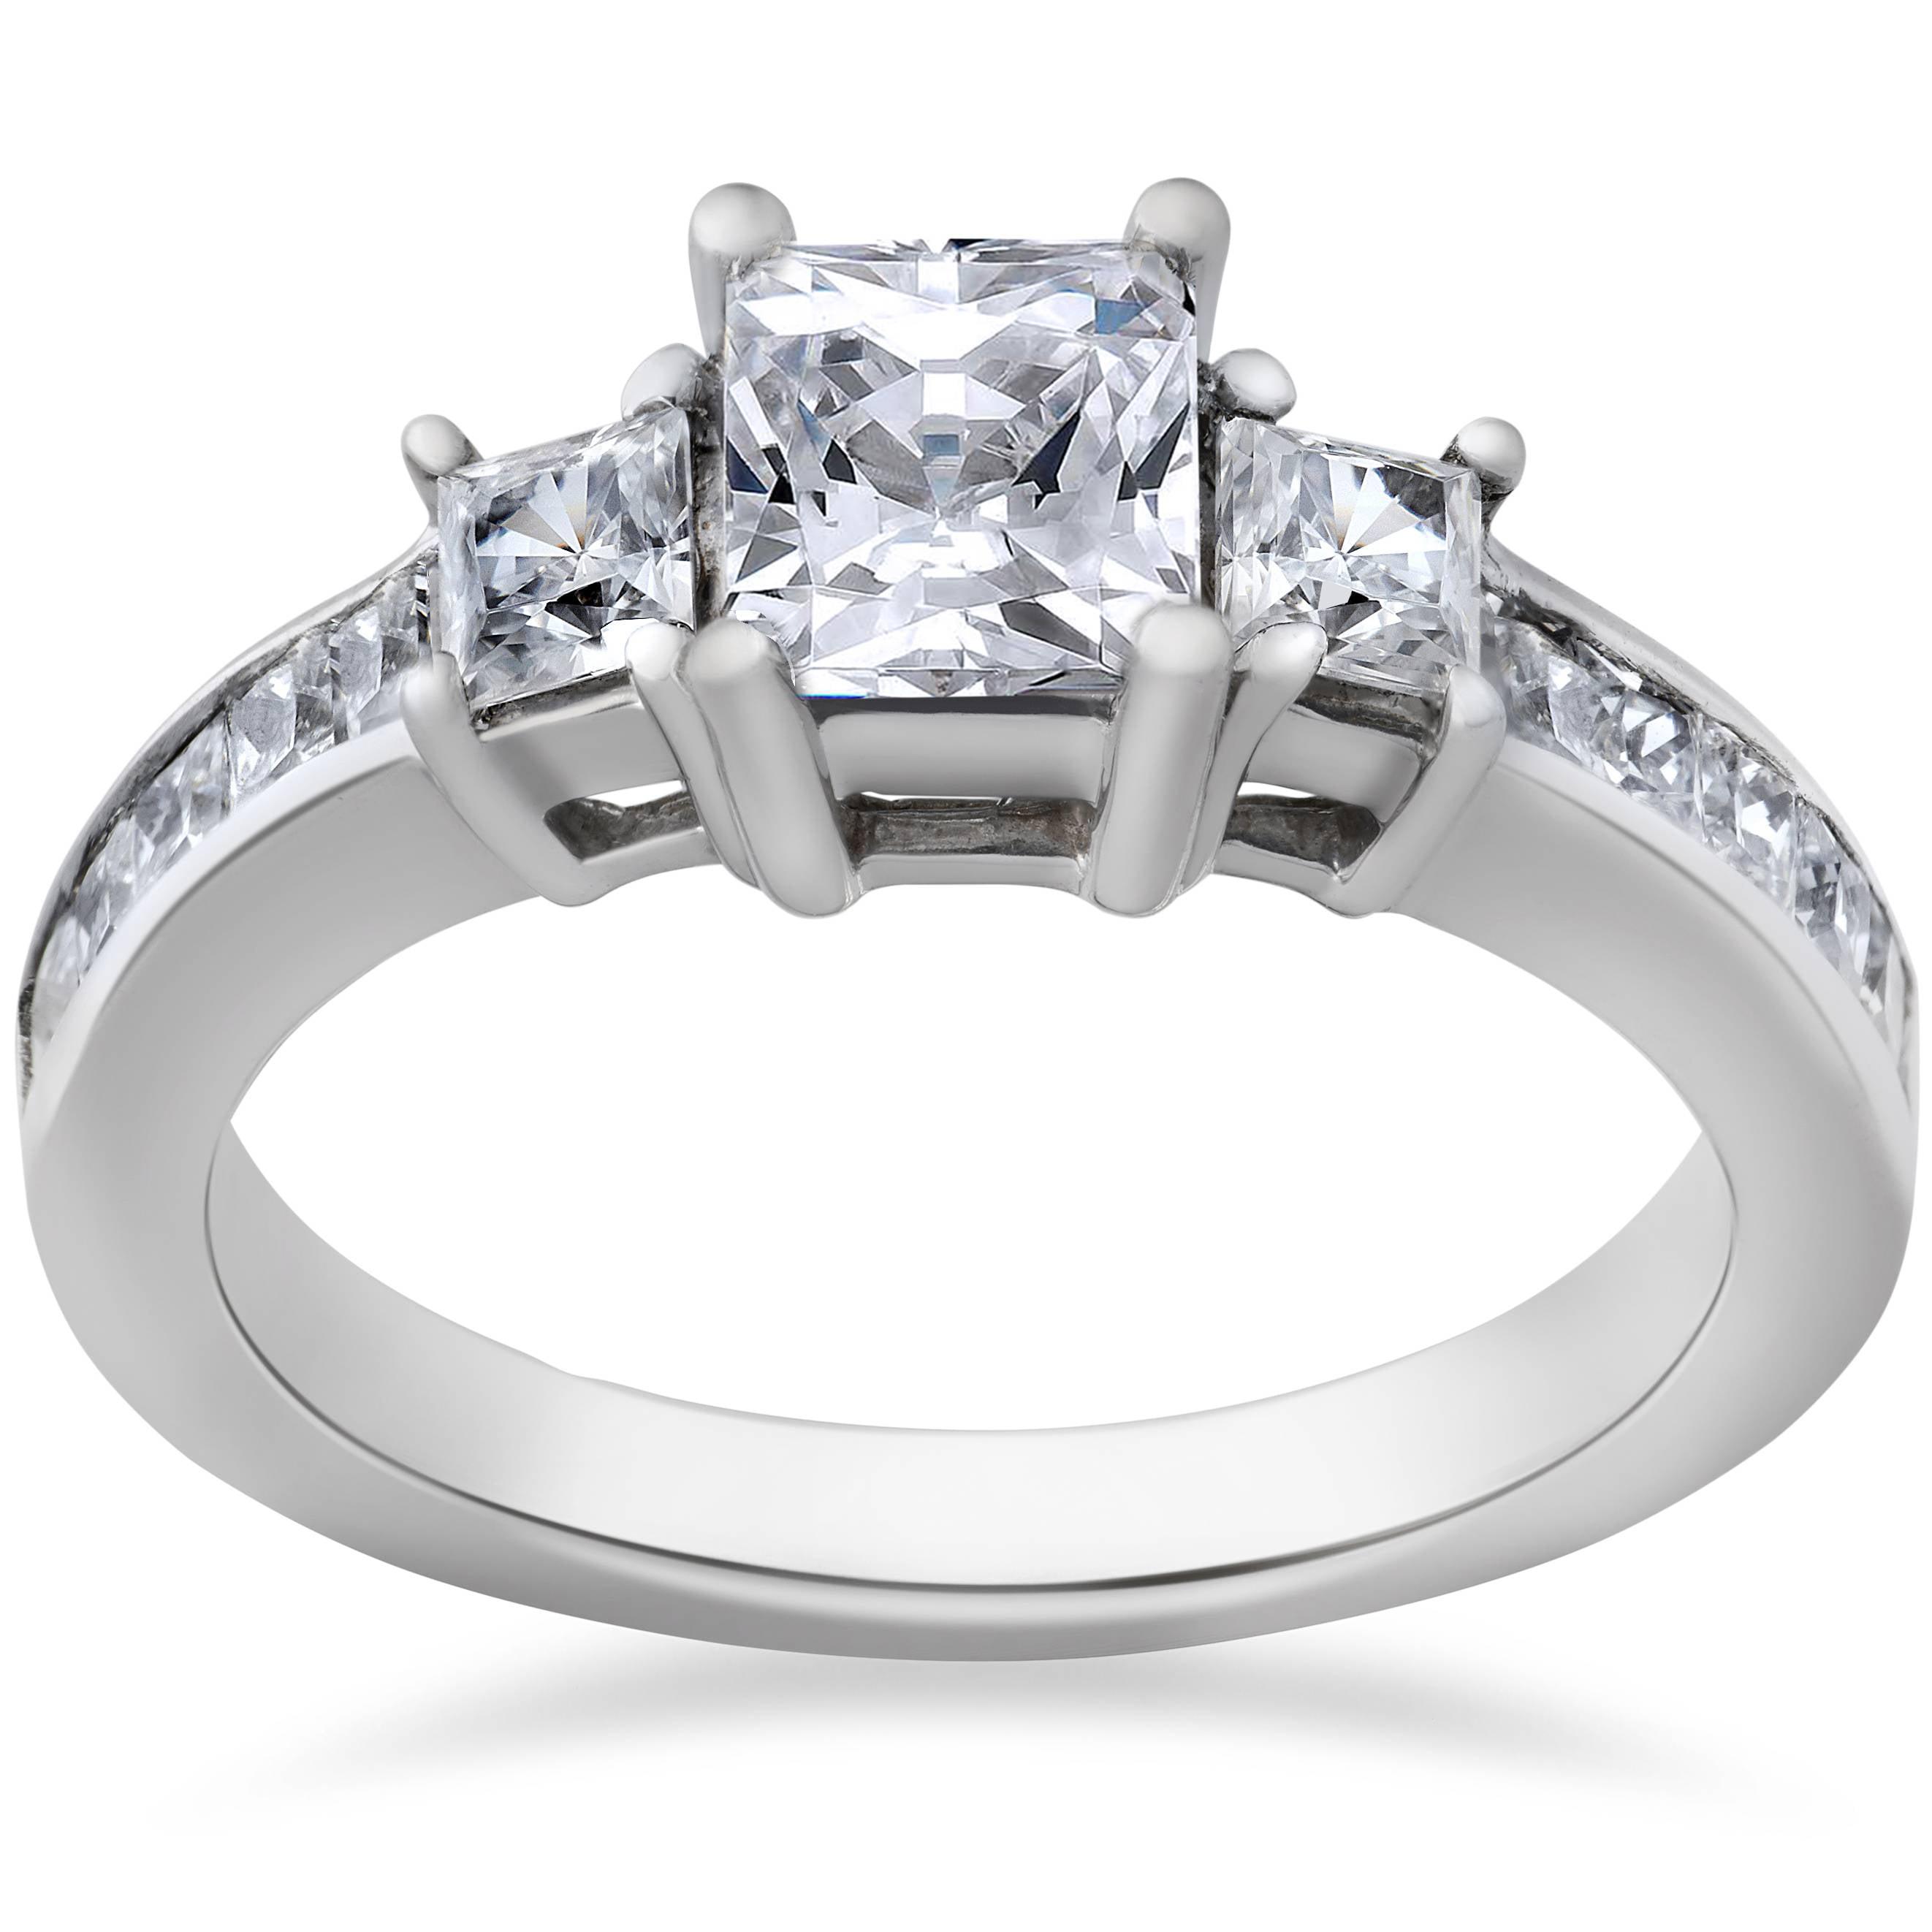 Pompeii3 Princess Cut Diamond Engagement Ring 3-Stone 1 1...